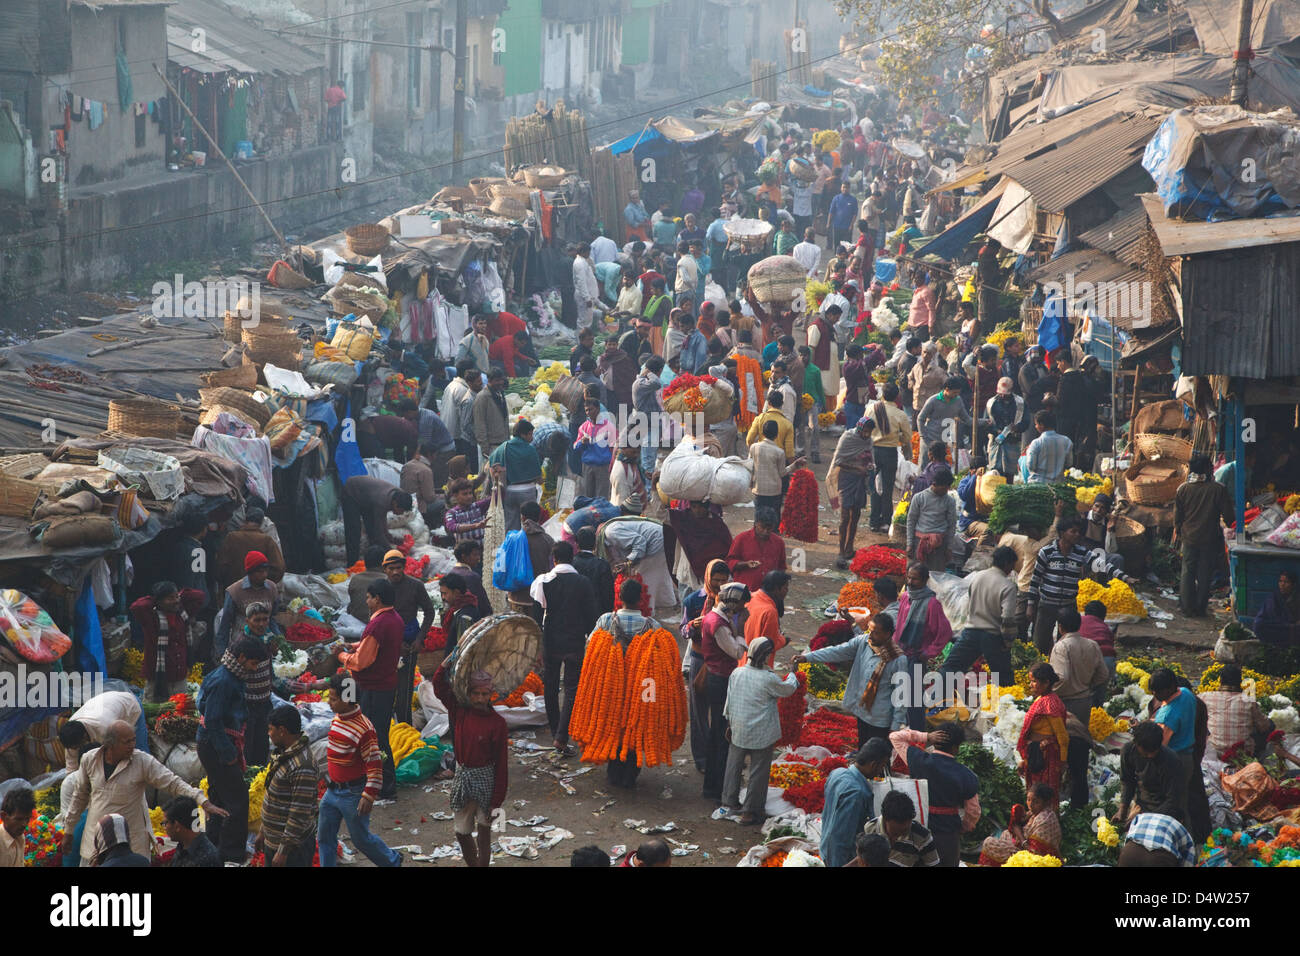 A colorful flower market near Malik (Mallick, Mullik) ghat near Howrah Bridge in Kolkata (Calcutta), India. - Stock Image